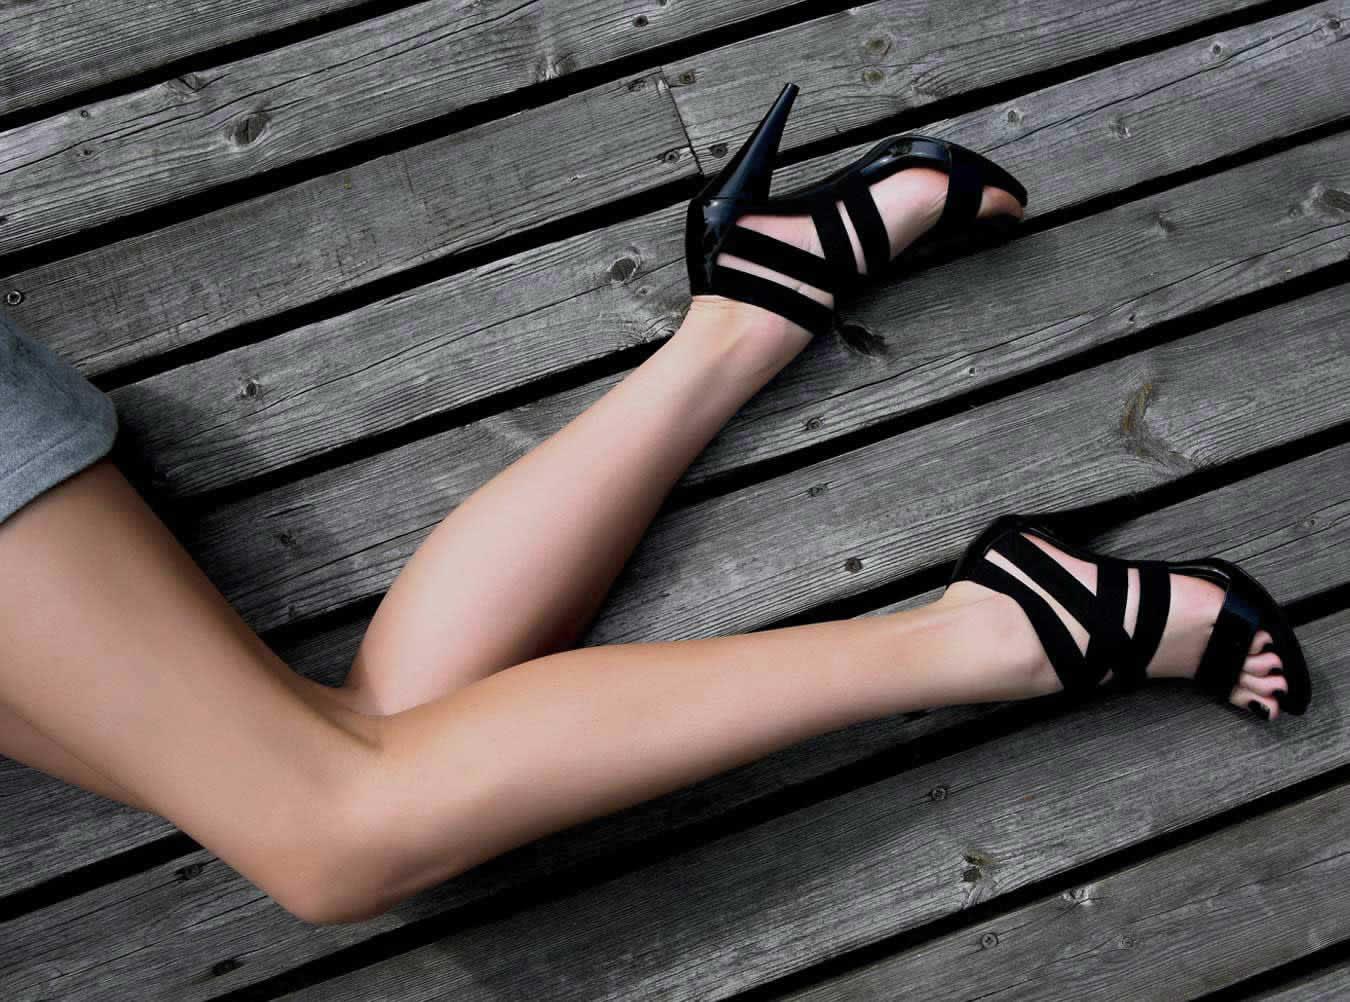 Puma Carson Runner Damen Schuhe Sneaker 13 women. PUMA Women's Carson Mesh WN's Competition Running Shoes. by PUMA. $ - $ $ 30 $ FREE Shipping on eligible orders. Peep-Toe Flat Buckle Shoes Roman Summer Sandals Sommer Schuhe Damen Sandalias Mujer.